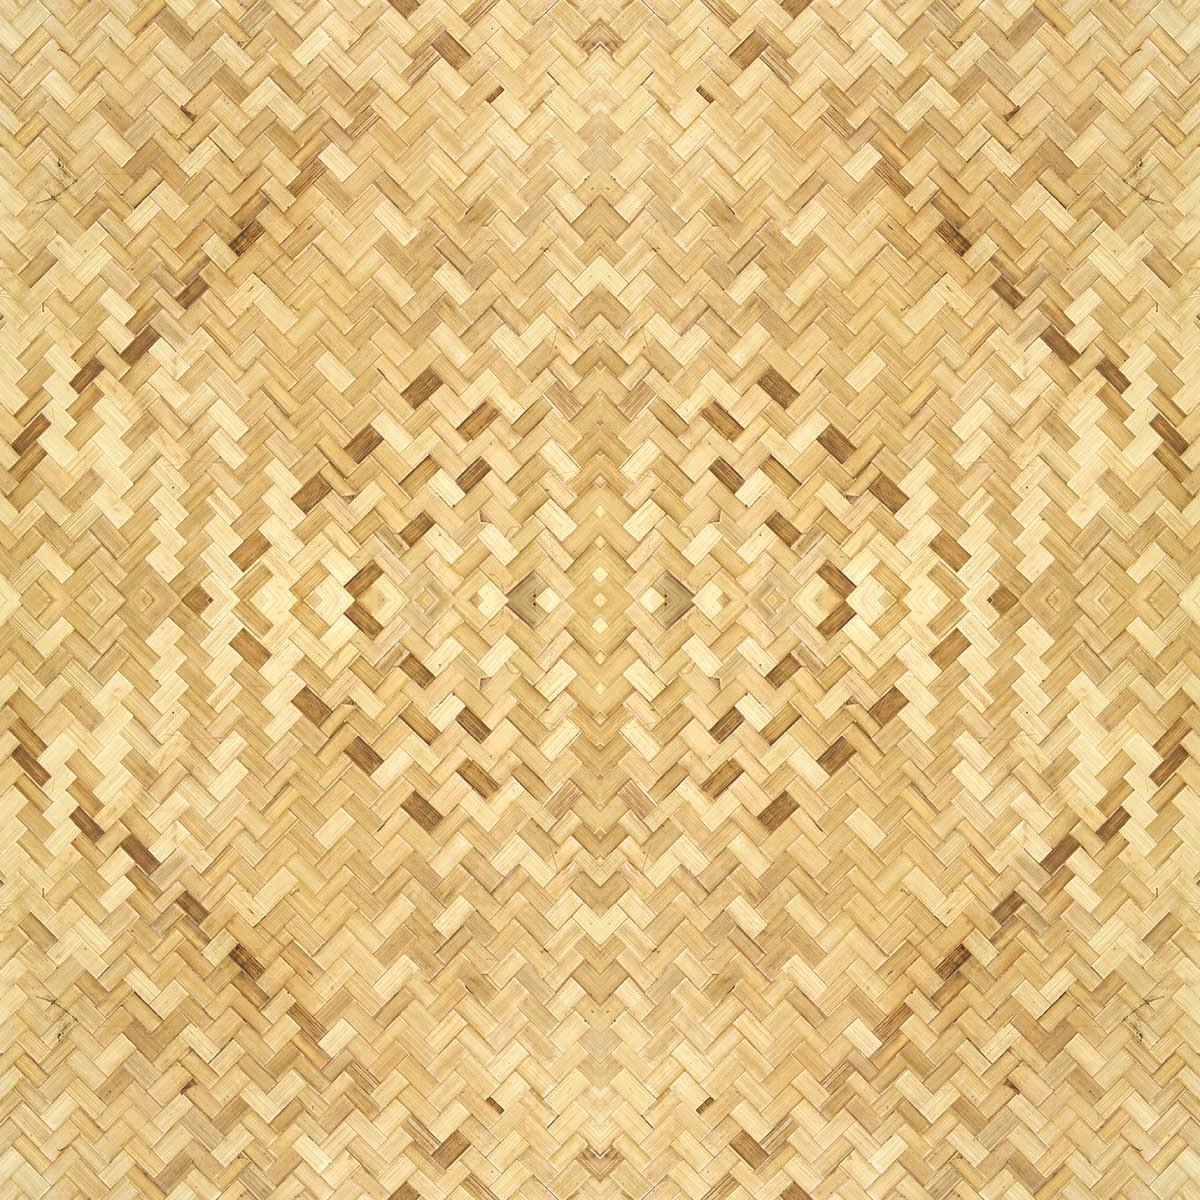 Adesivo Decorativo Palha 45cm x 2m - Plavitec